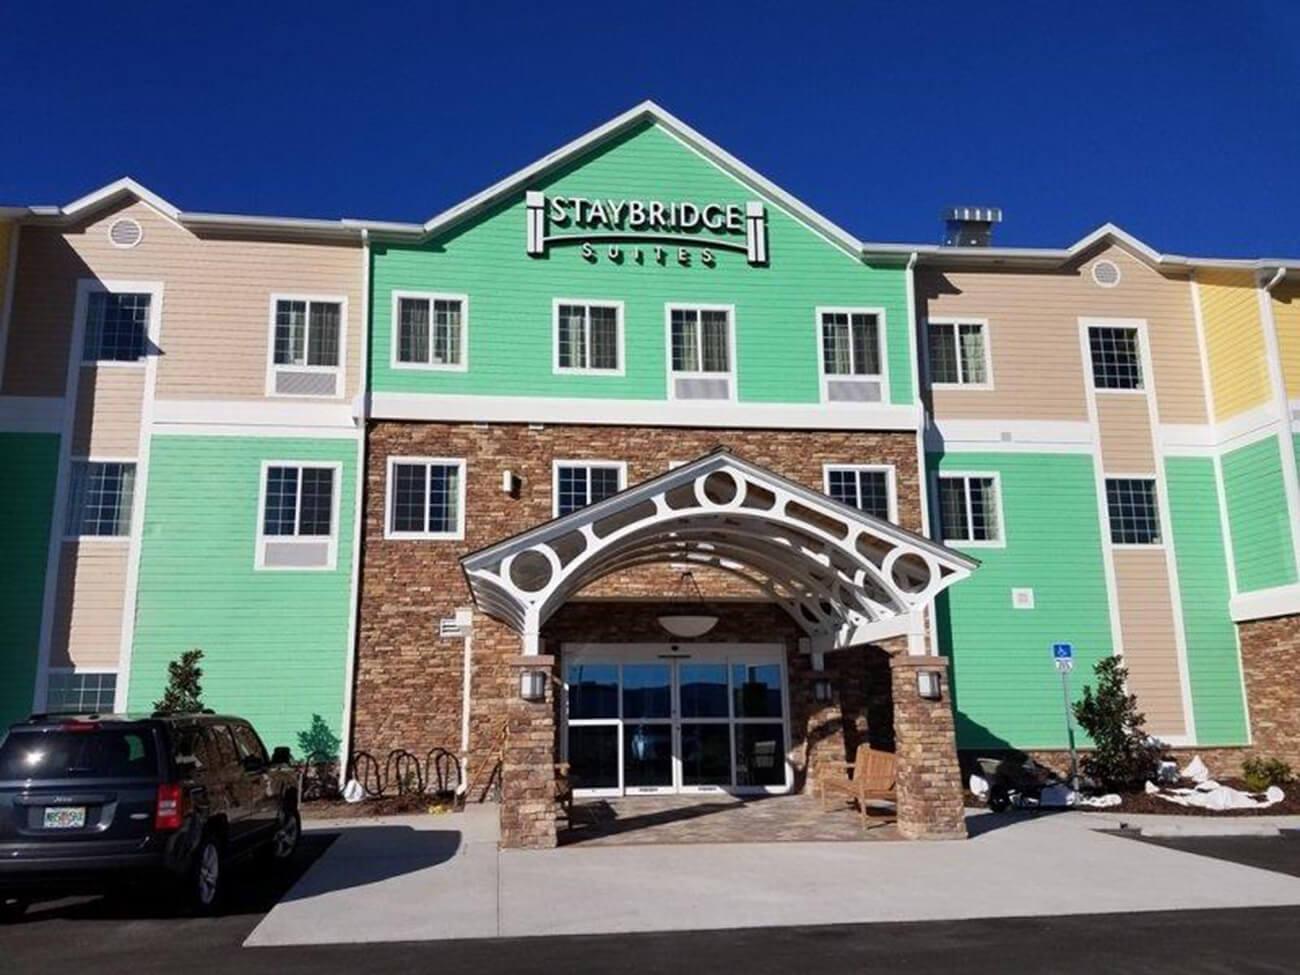 Exterior entrance of Staybridge Suites Lakeland West